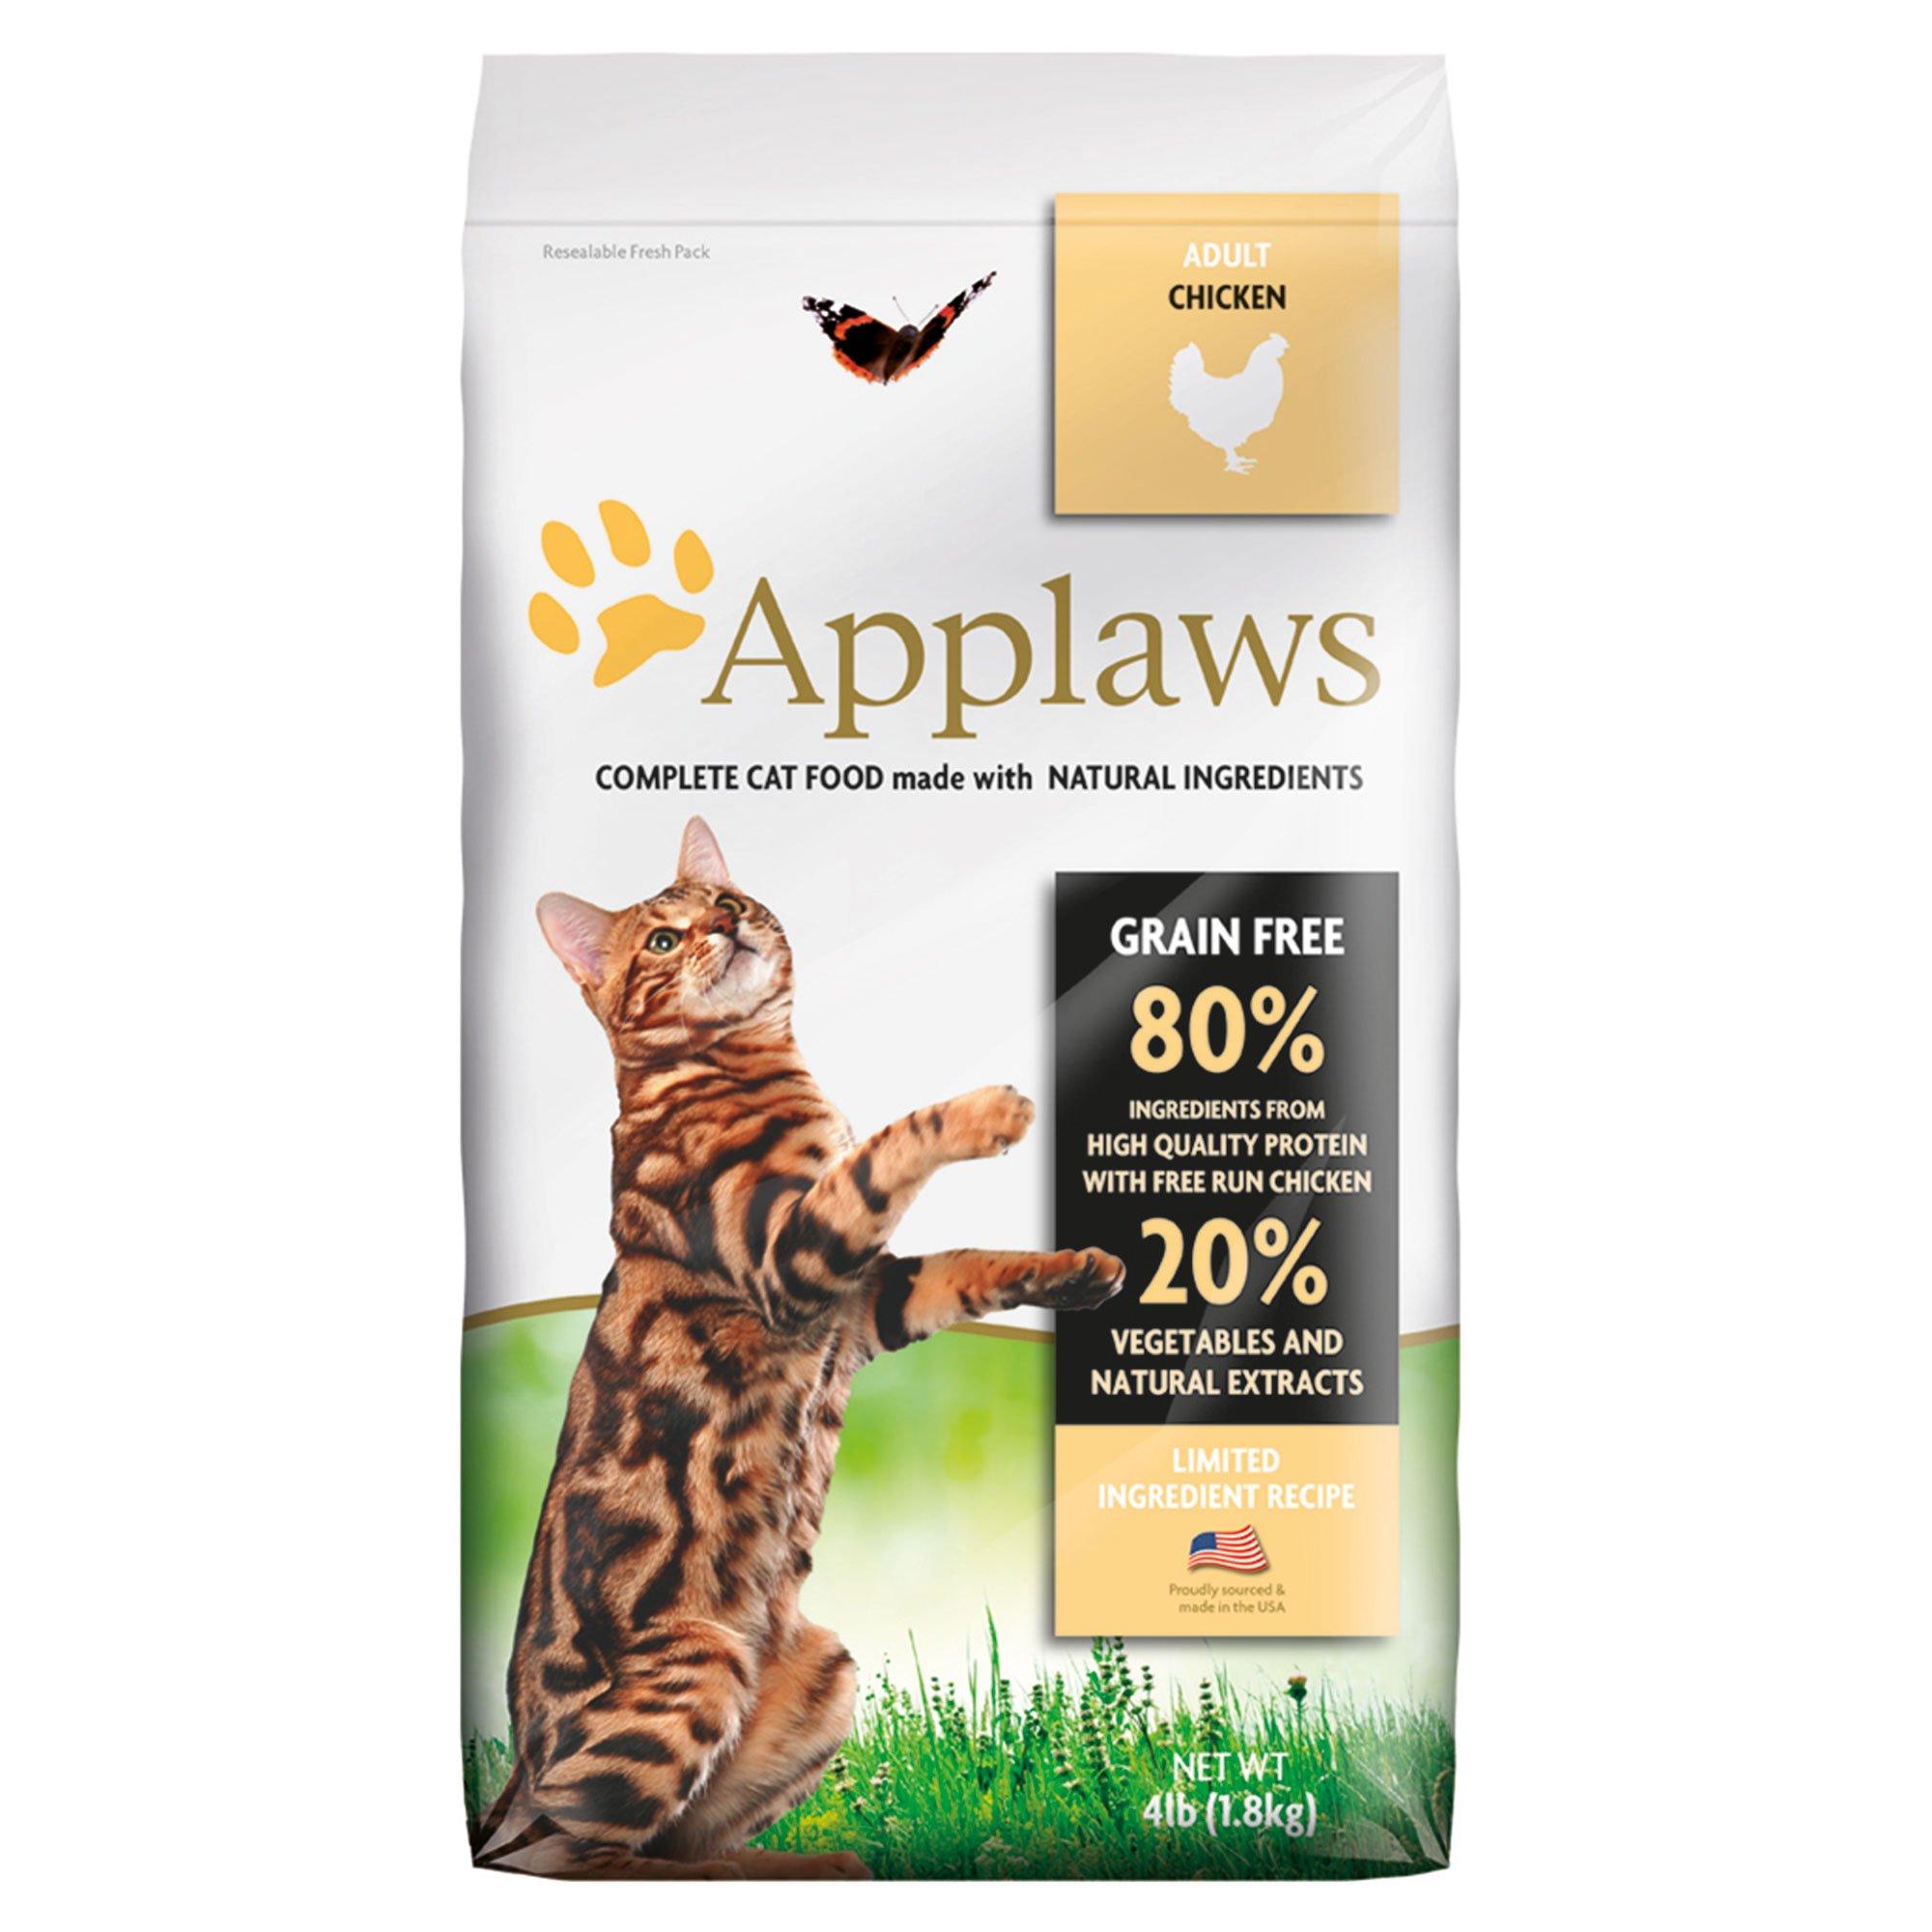 Applaws chicken grain free dry cat food petco forumfinder Images